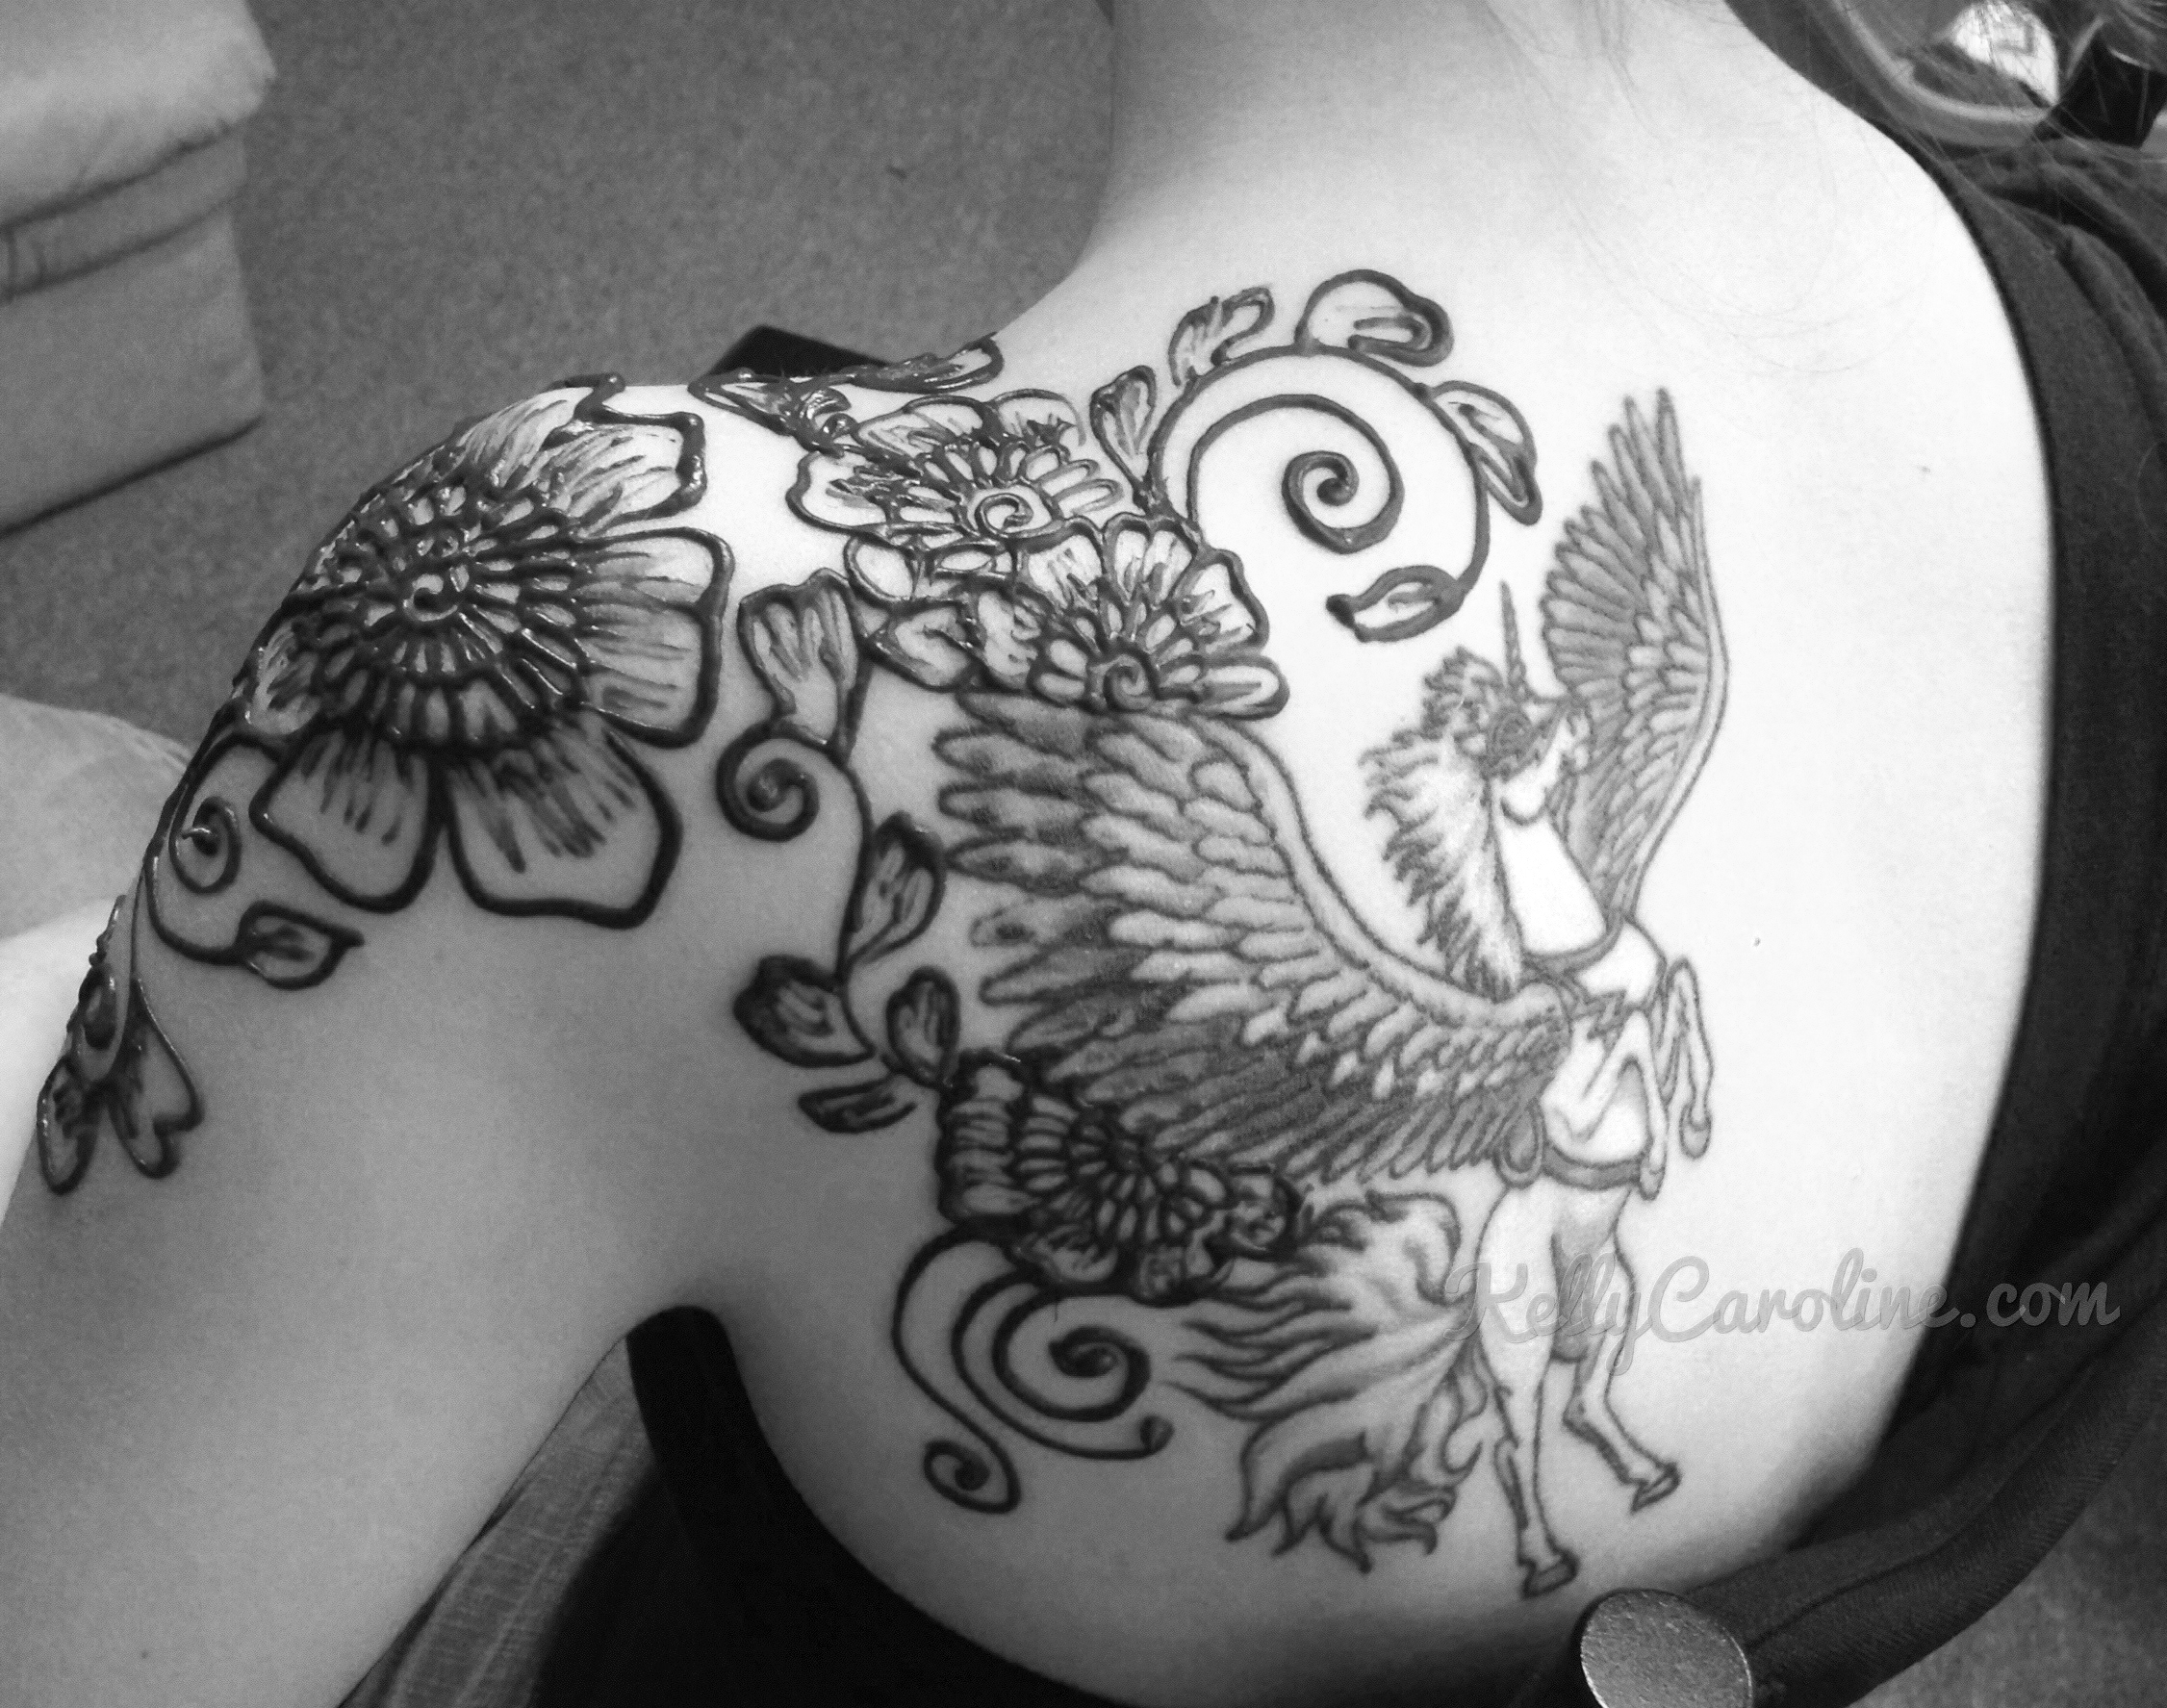 Tattoo henna kelly caroline for Henna tattoo permanent